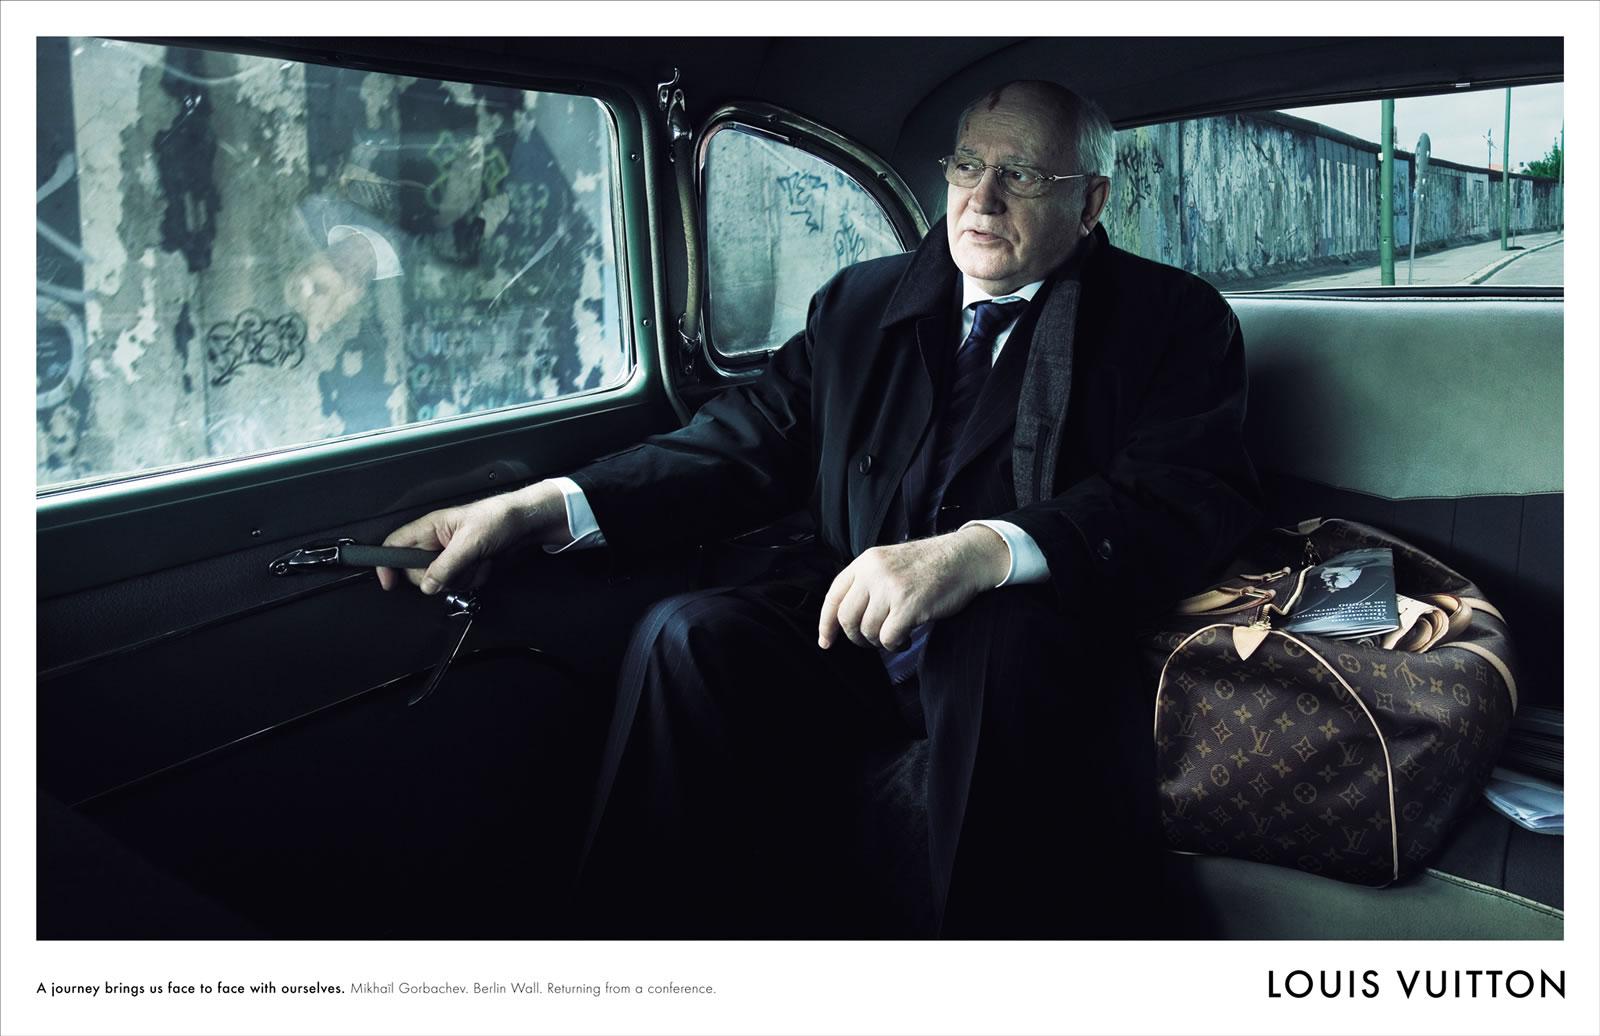 Annie Leibovitz - Louis Vuitton - Mikhail Gorbatchev.jpg